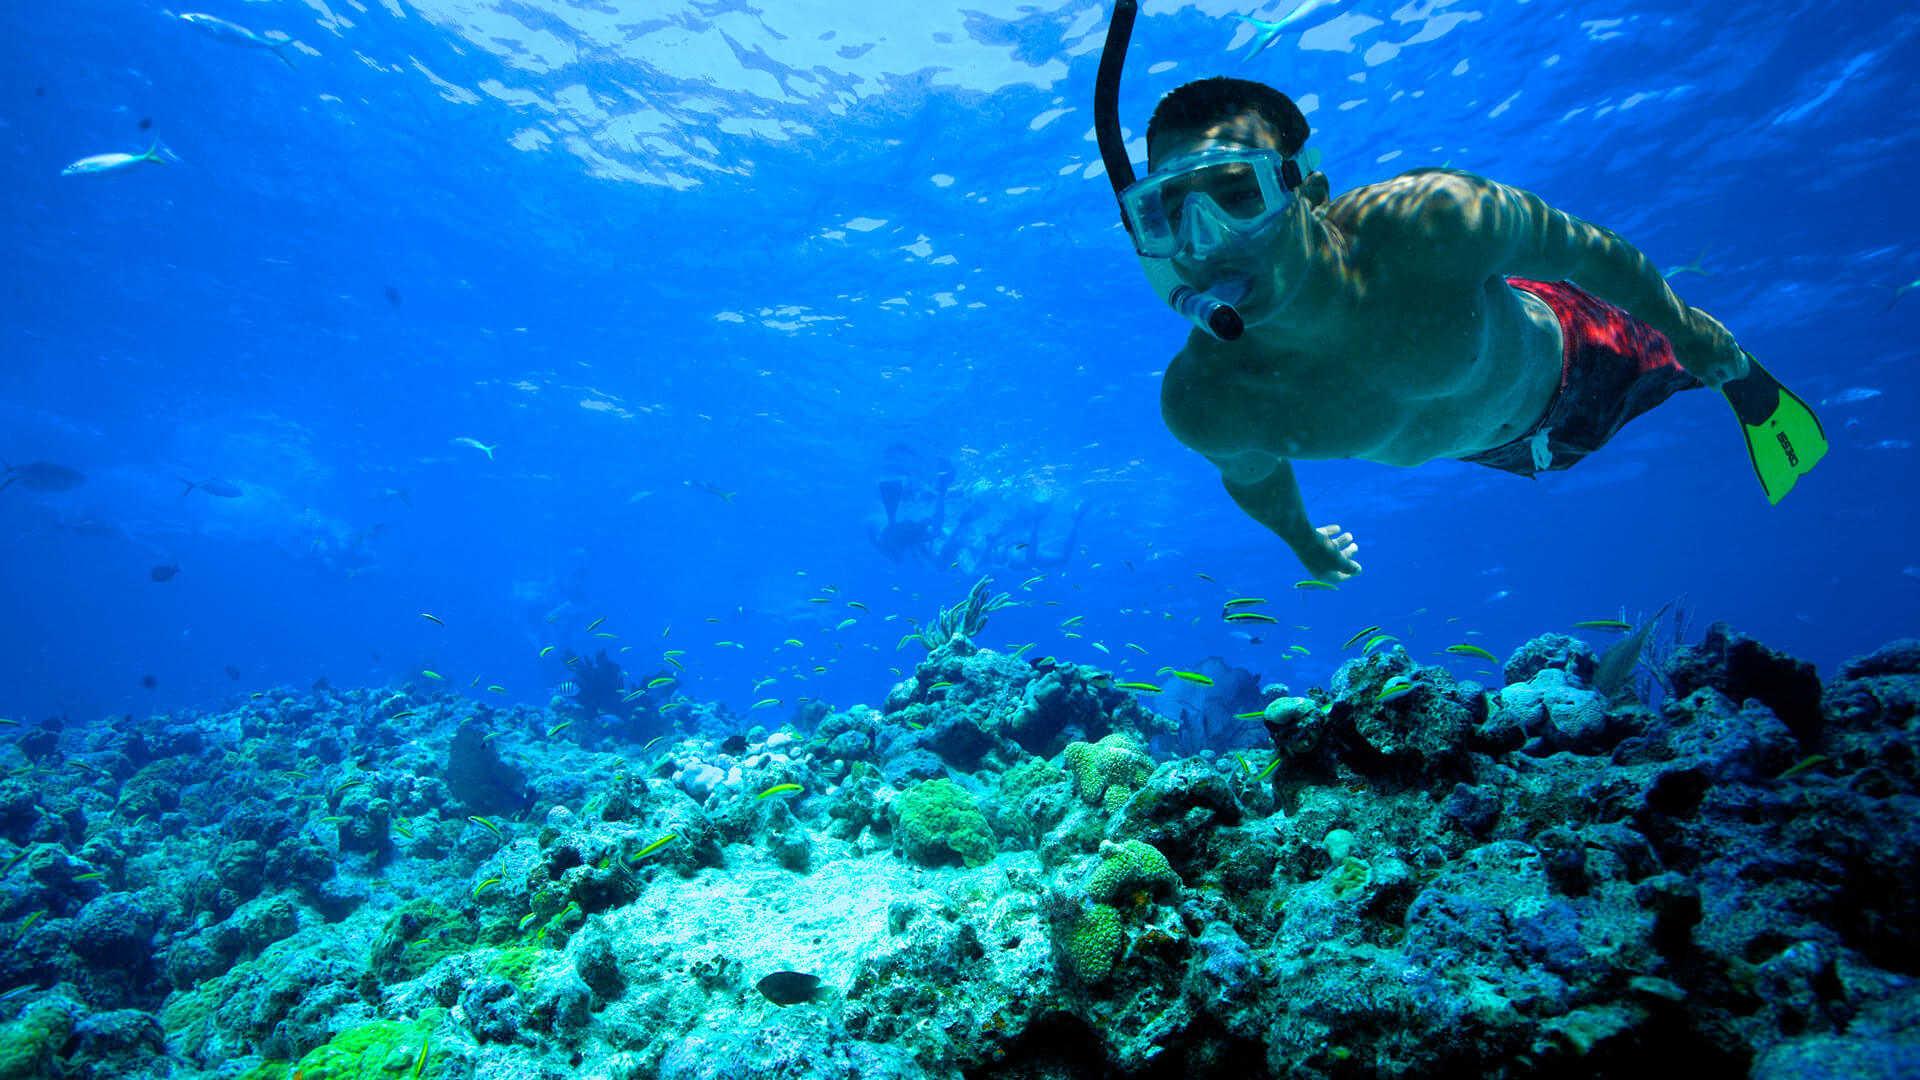 http://louladakis-apts.gr/wp-content/uploads/2016/05/louladakis_activities_snorkeling.jpg